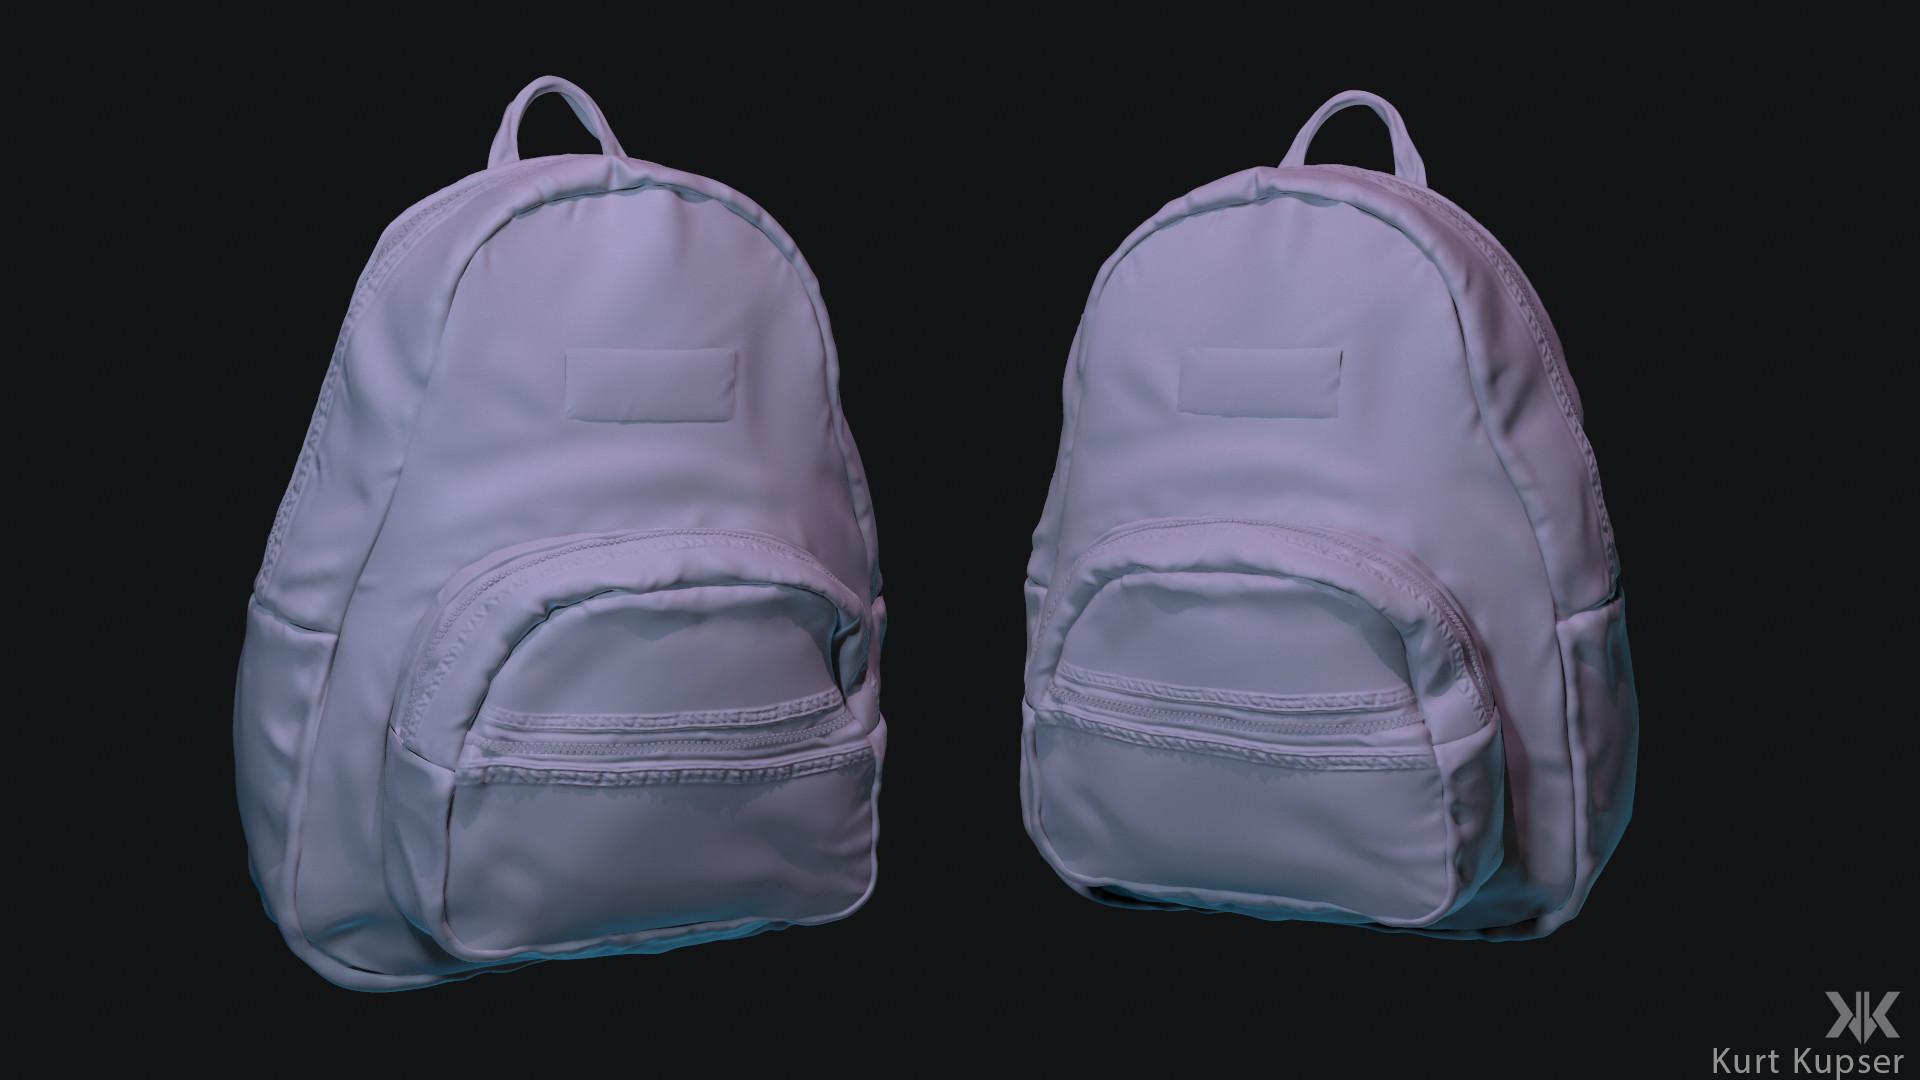 Kurt kupser backpack 05